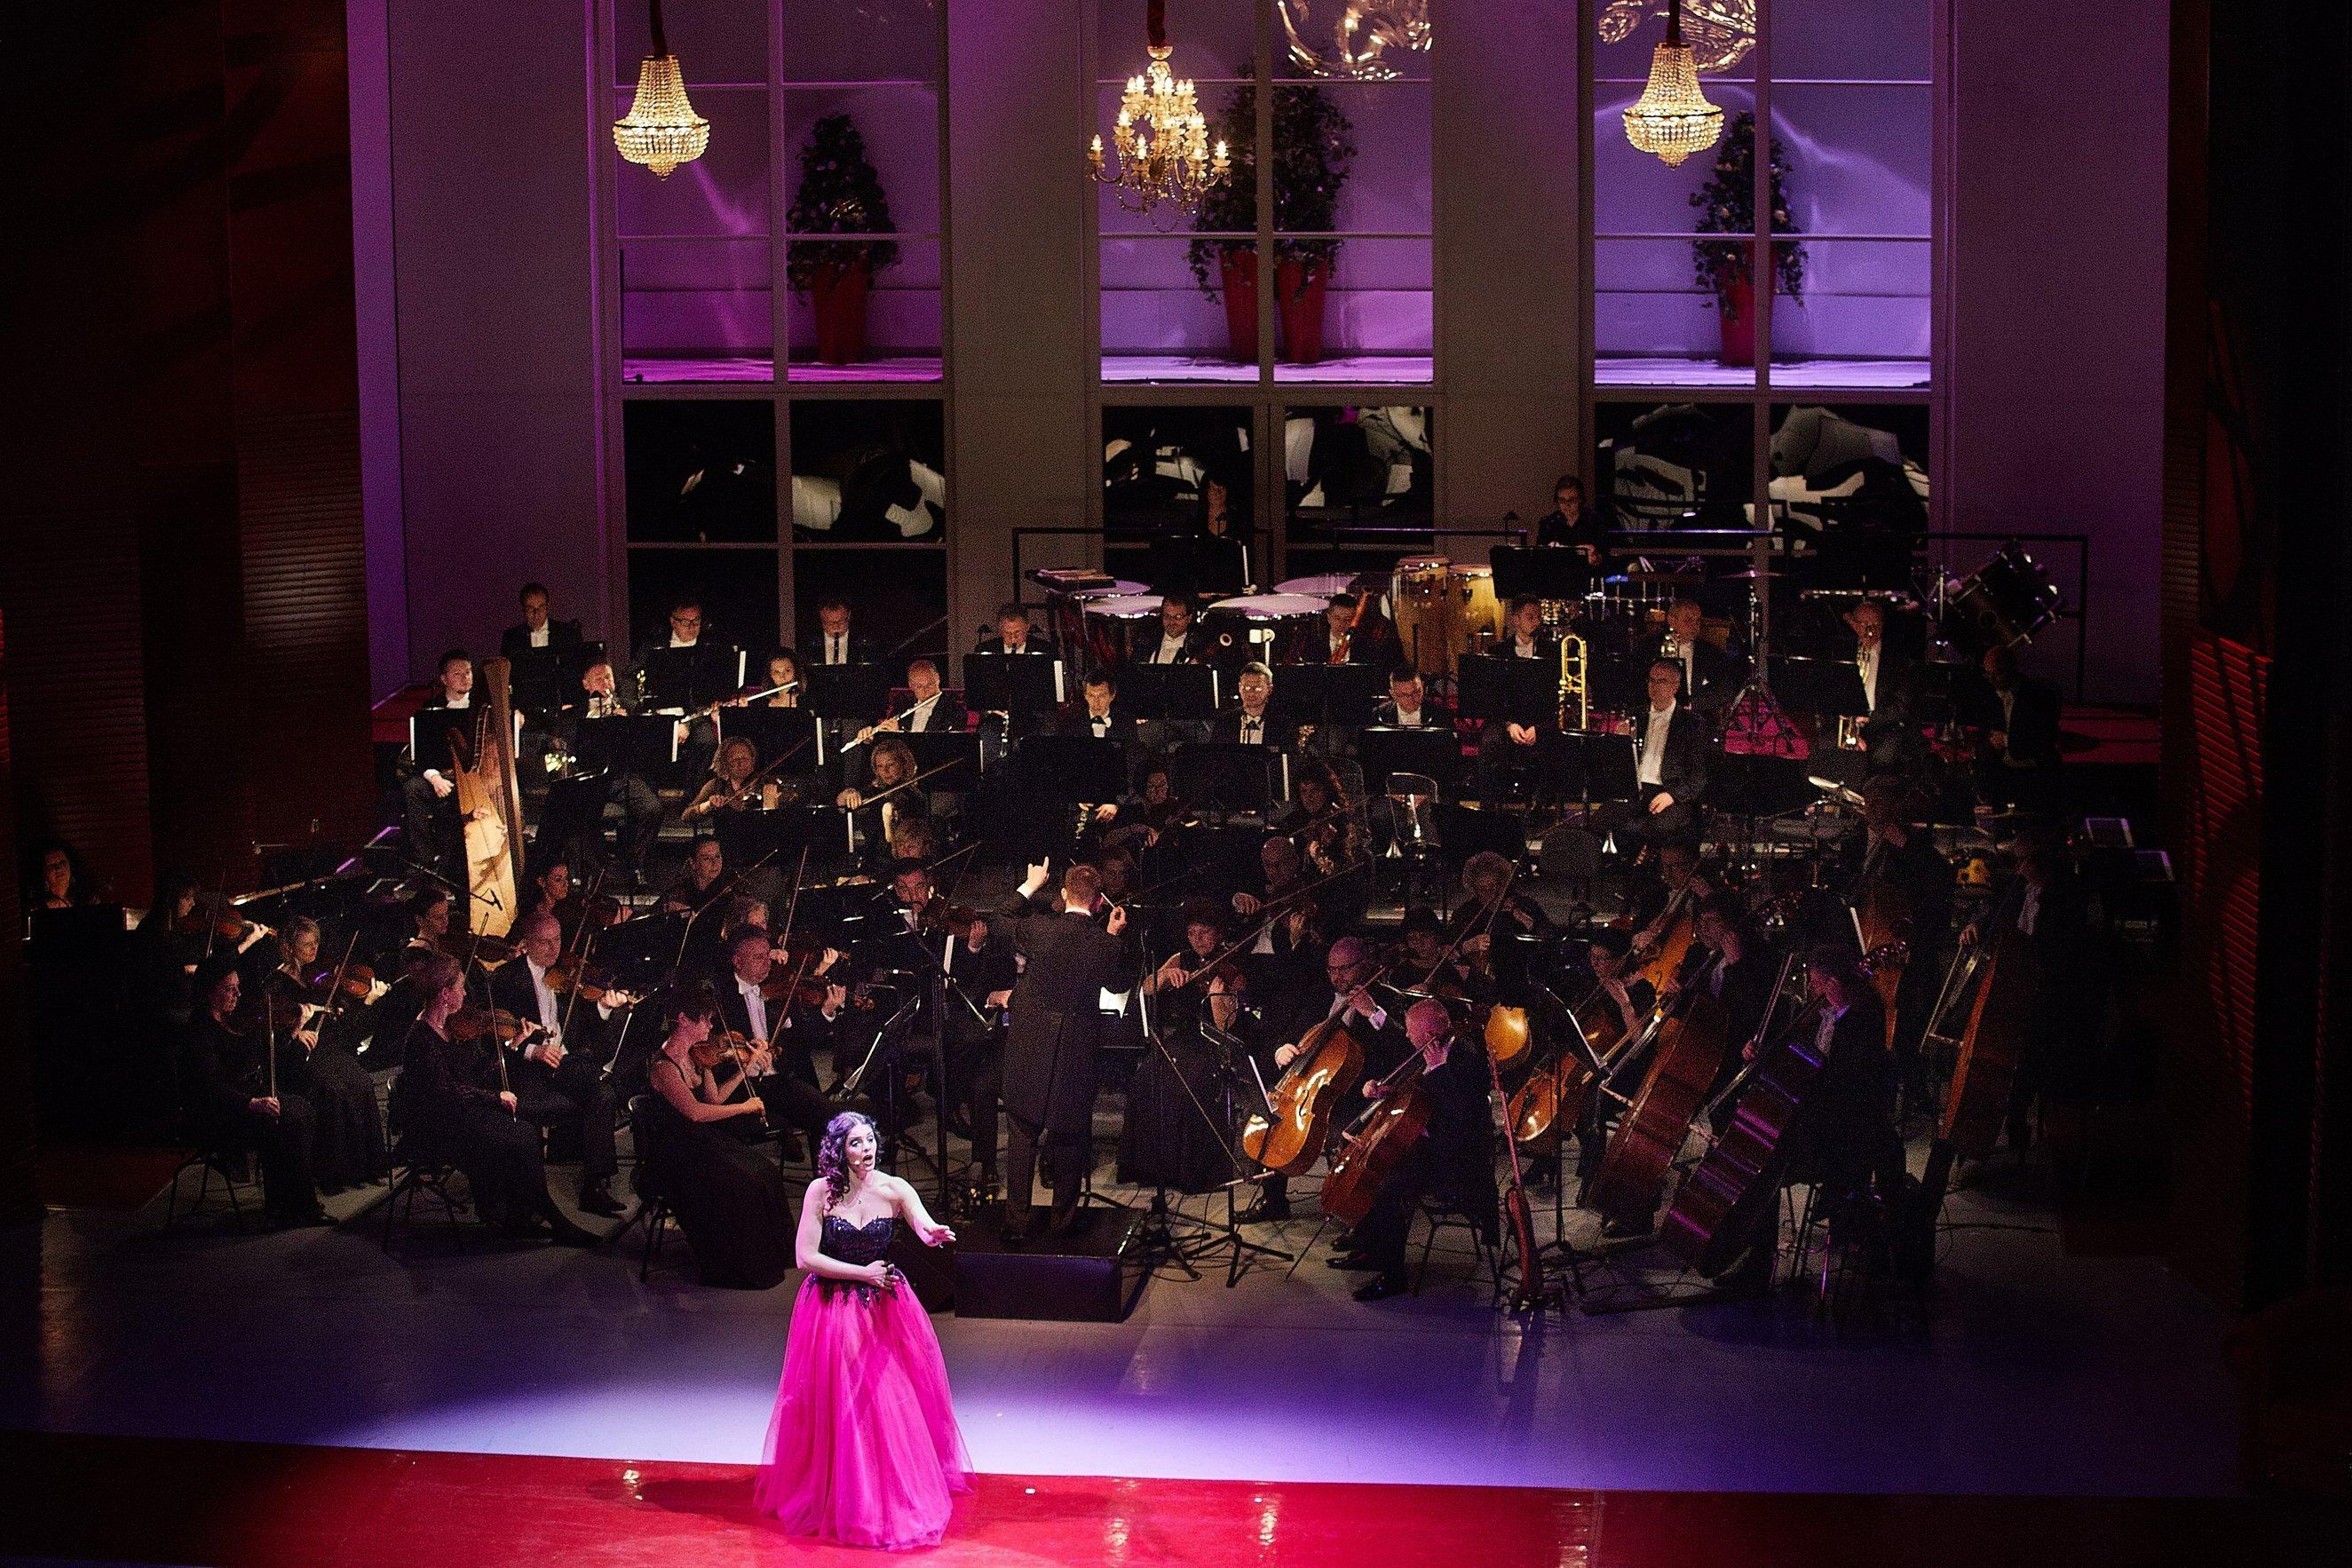 Koncert Opera 2008-2018